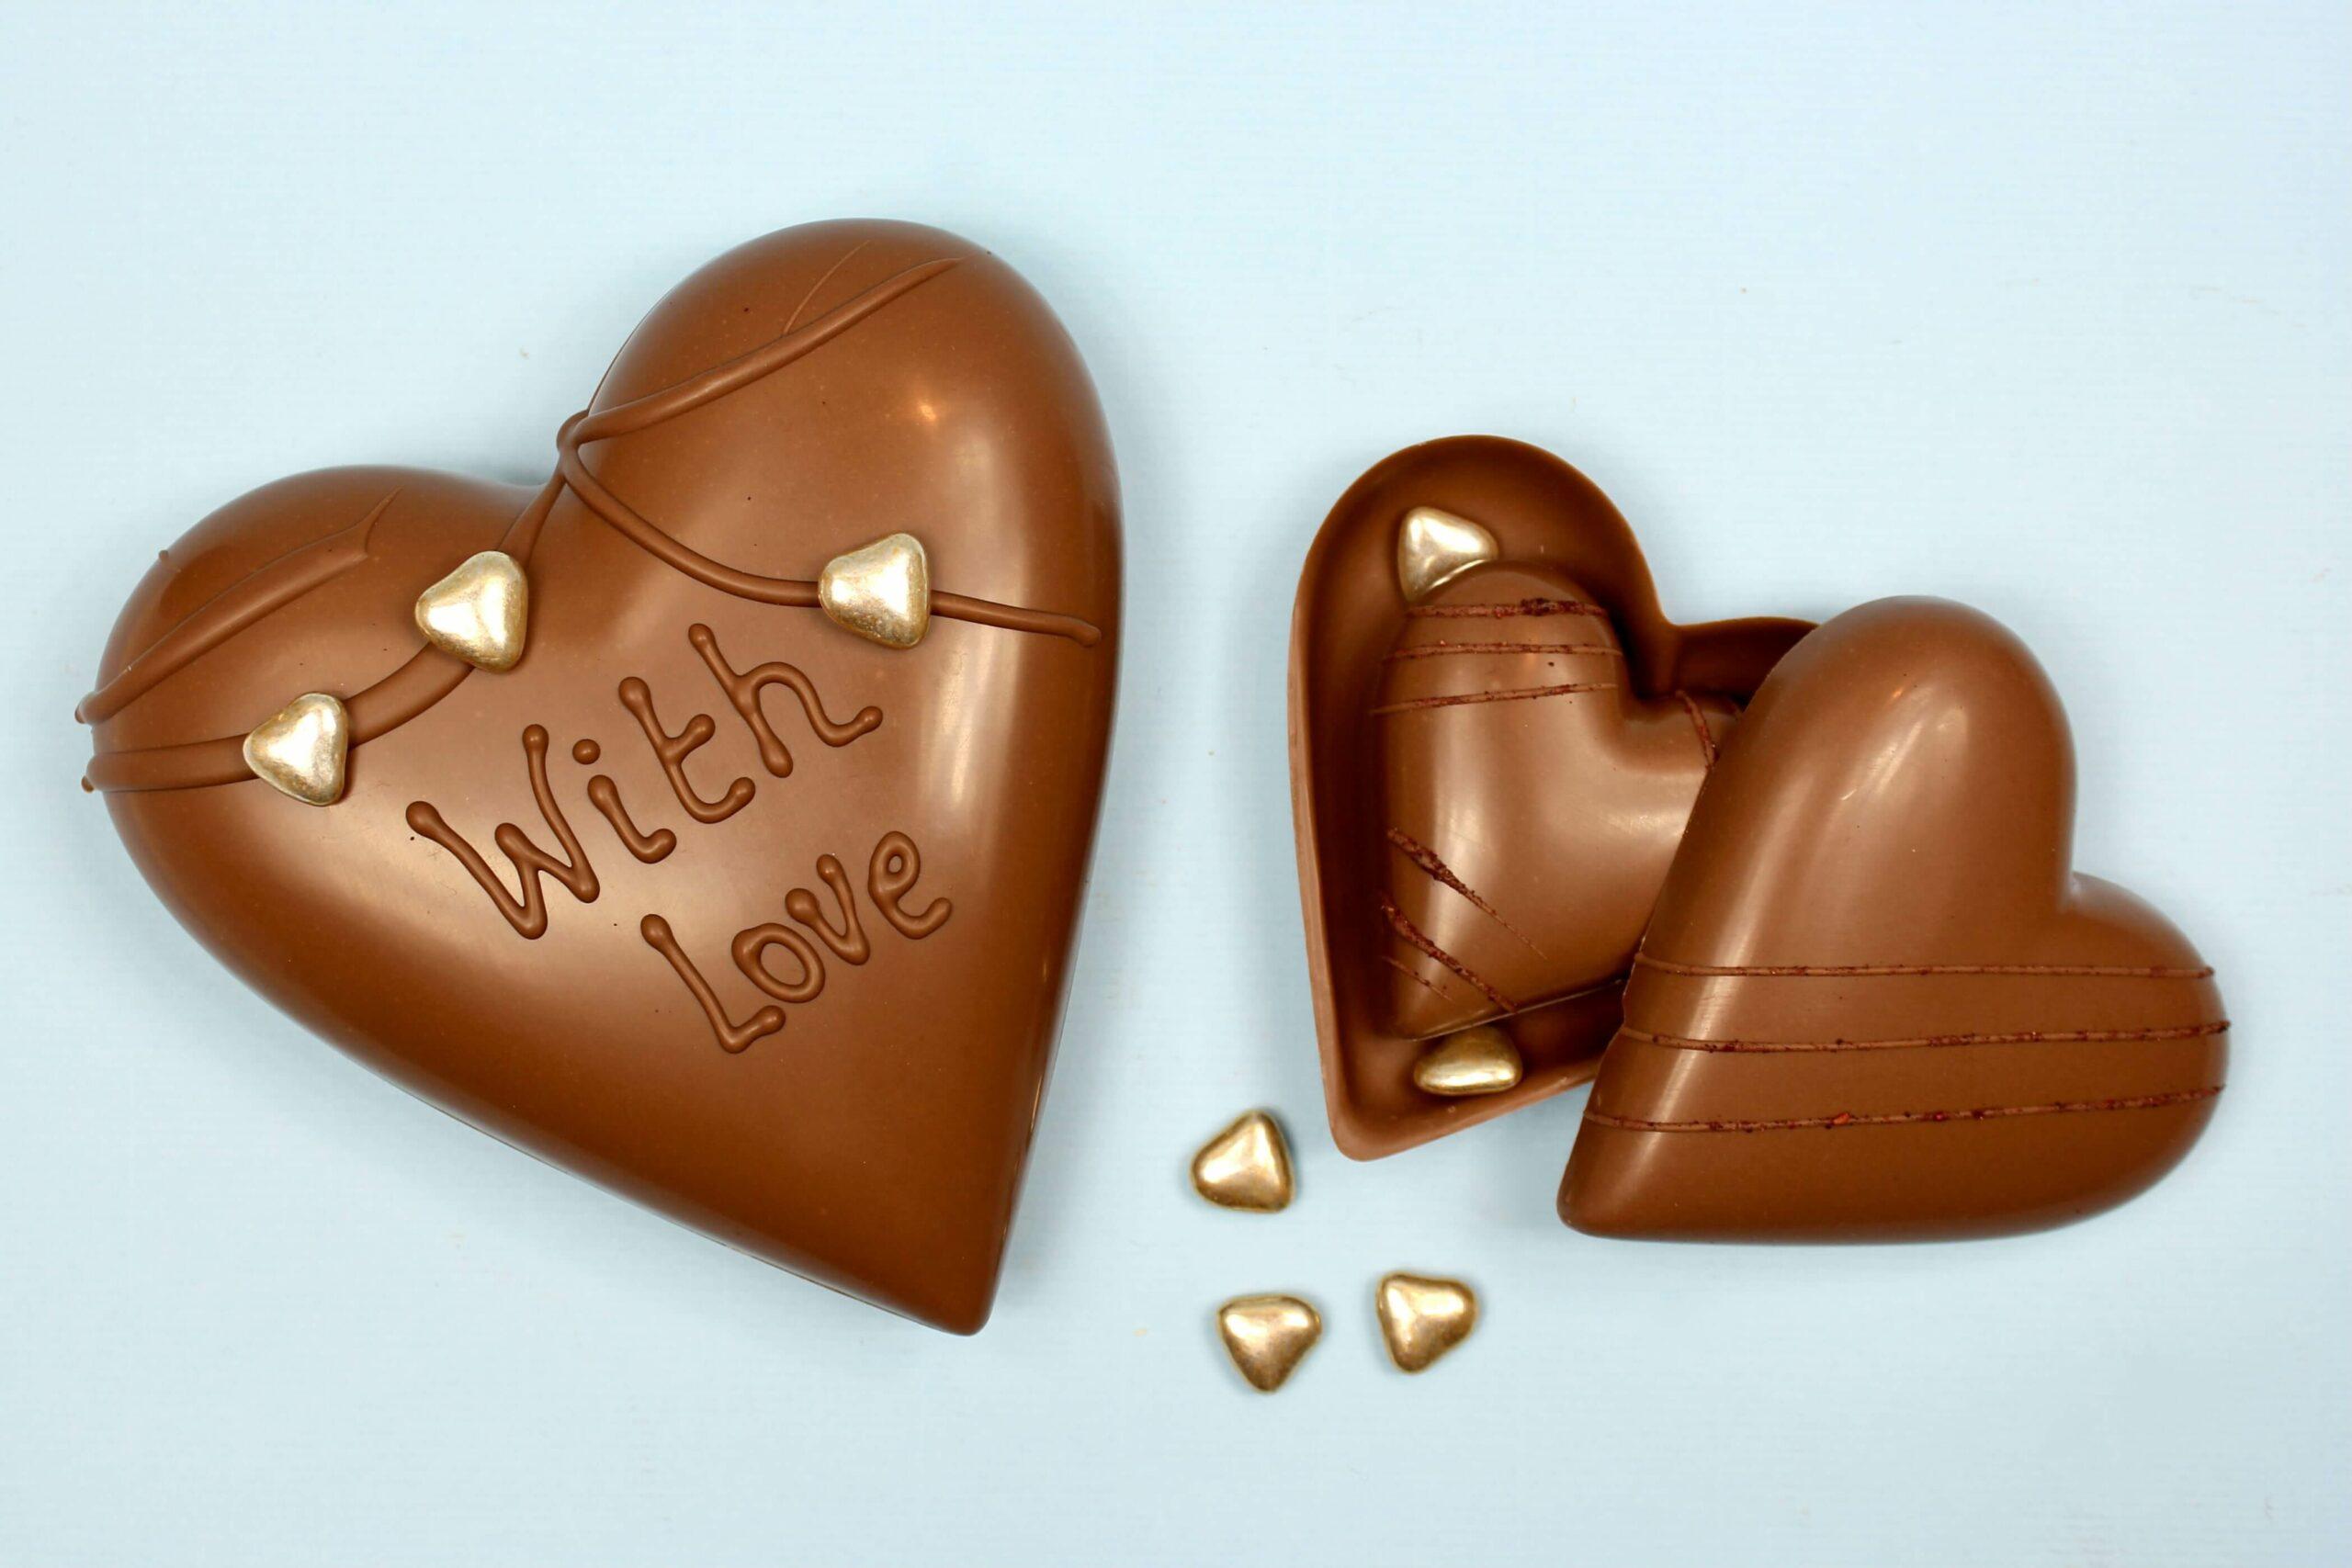 hd ghent matroeska heart milk chocolate valentine 2021 set of tree one in two